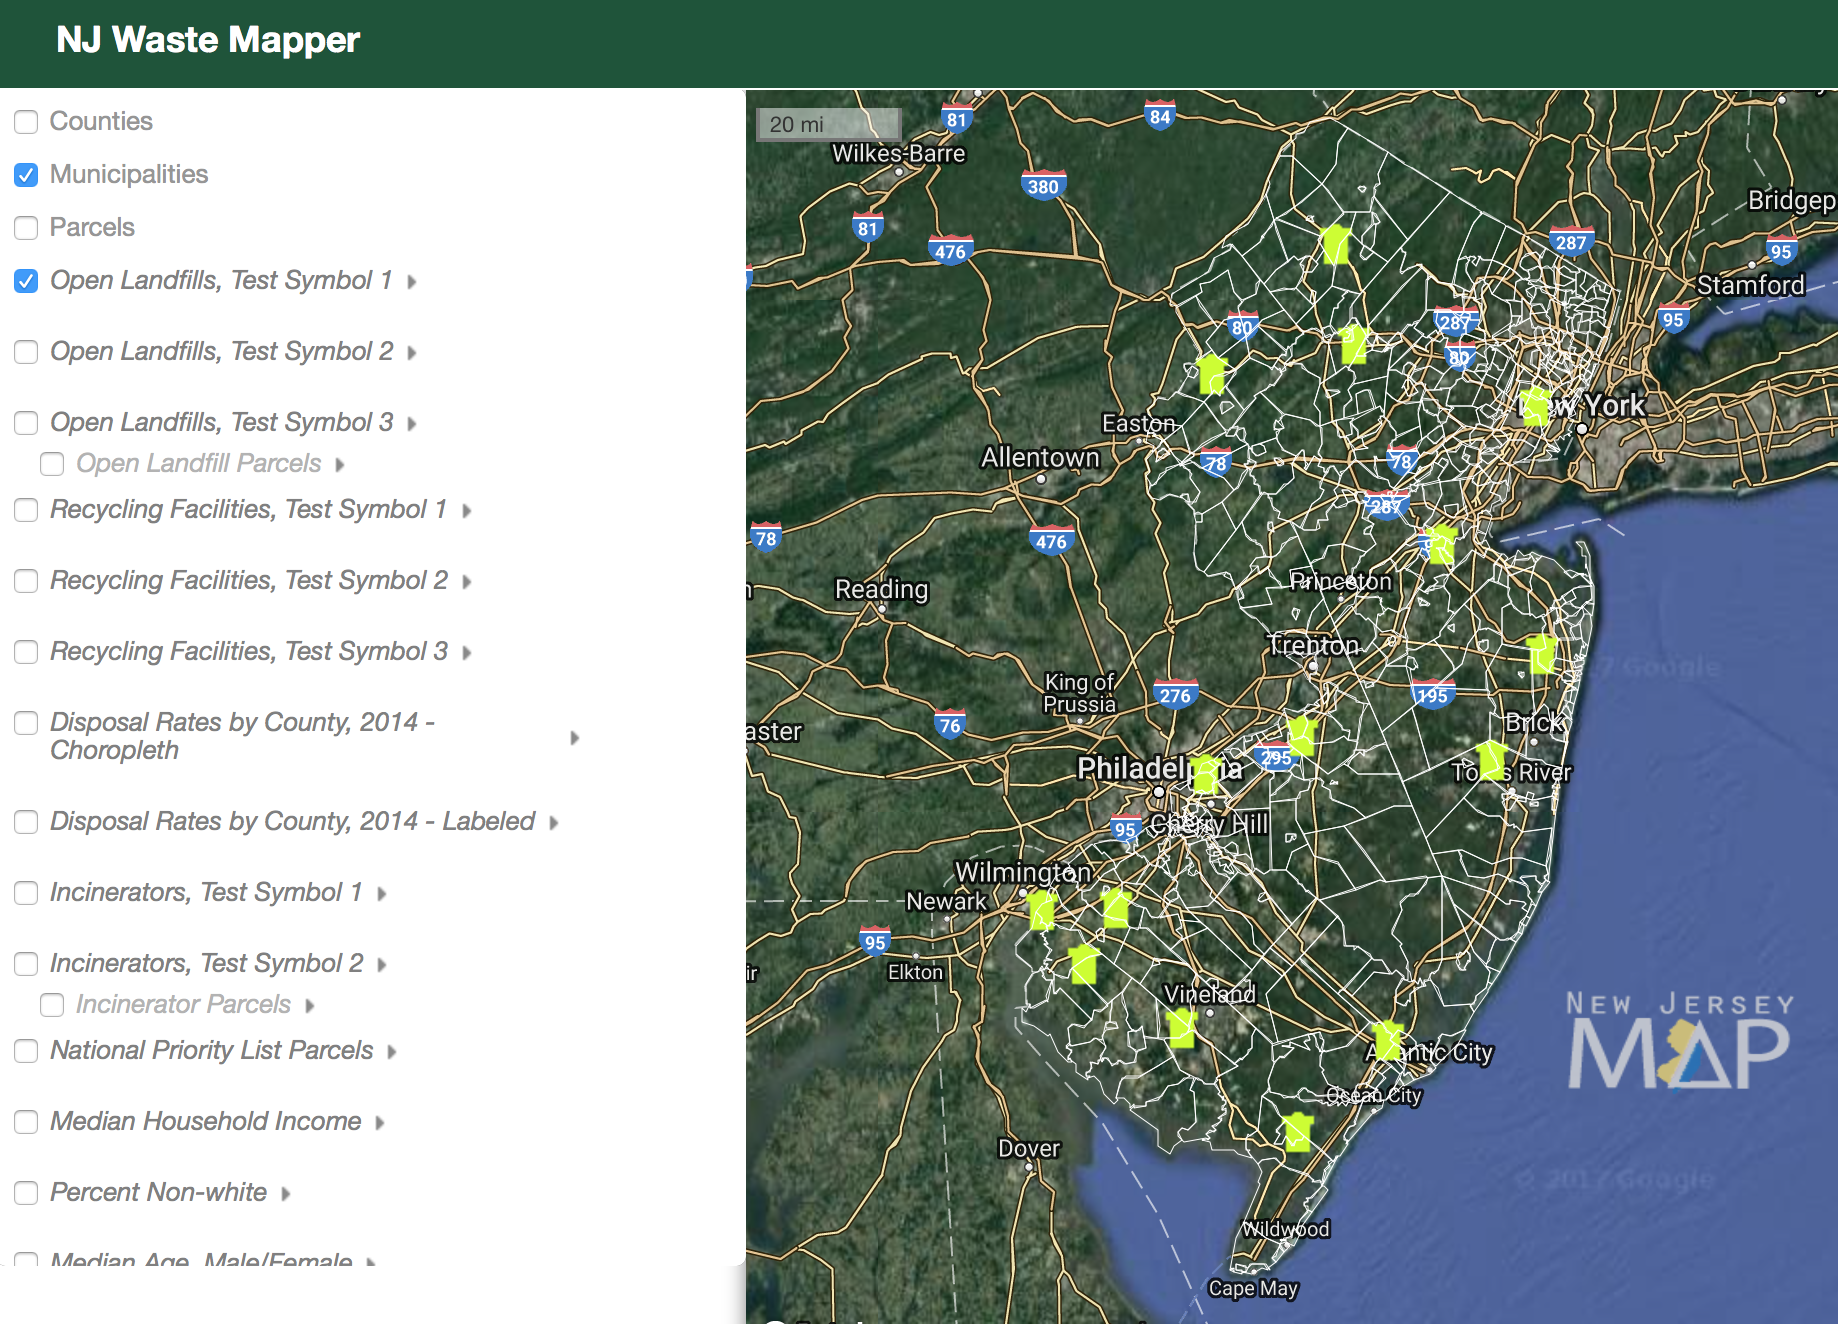 NJ Waste Mapper Theme screenshot, 2017